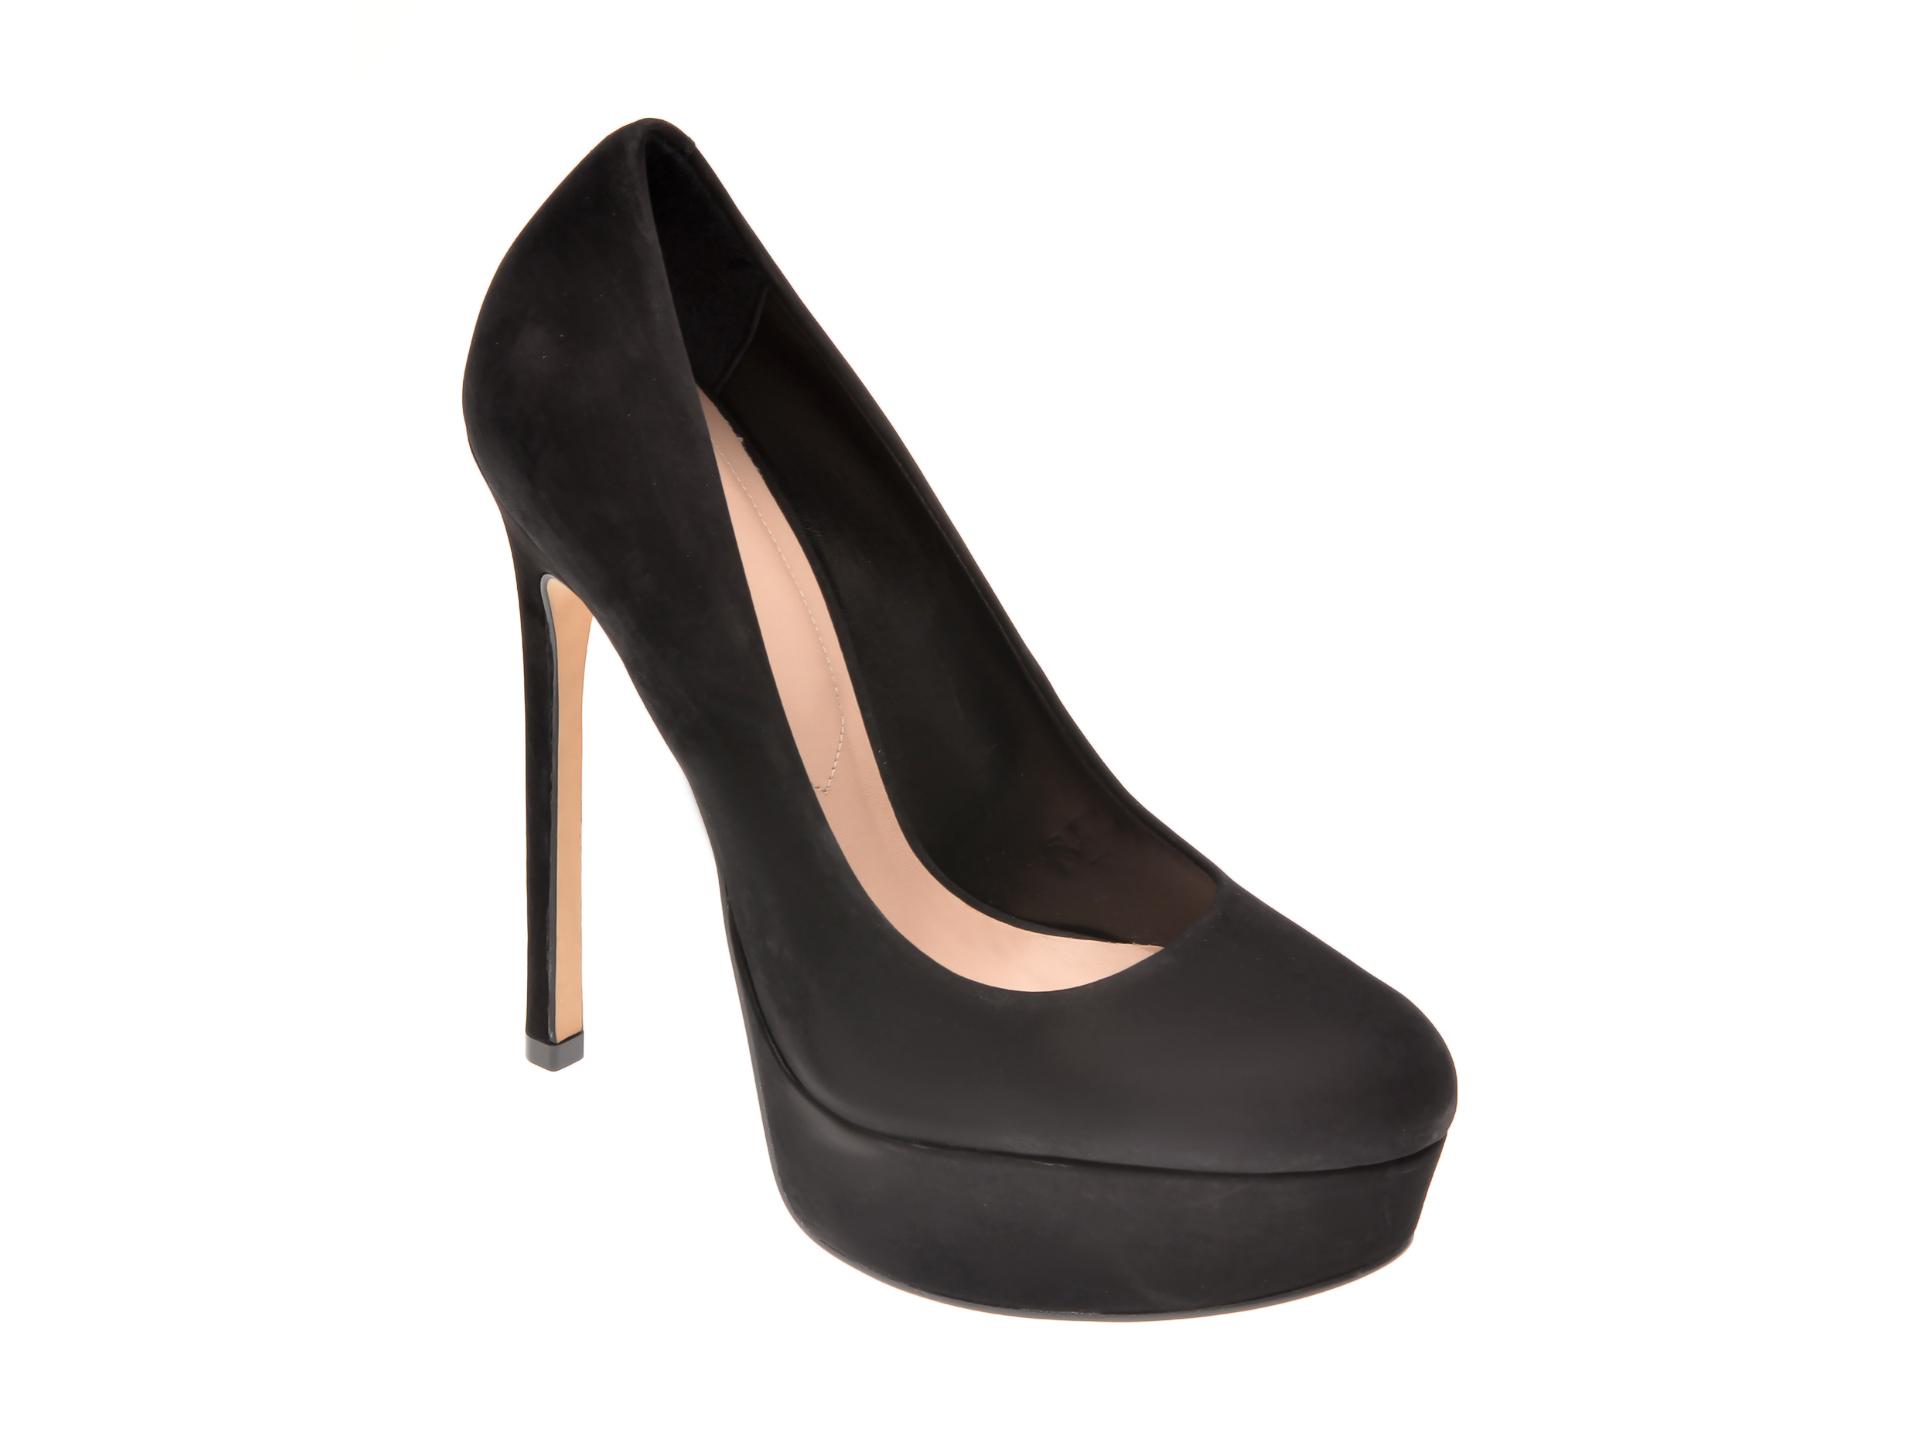 Pantofi ALDO negri, Kassandra001, din nabuc imagine otter.ro 2021